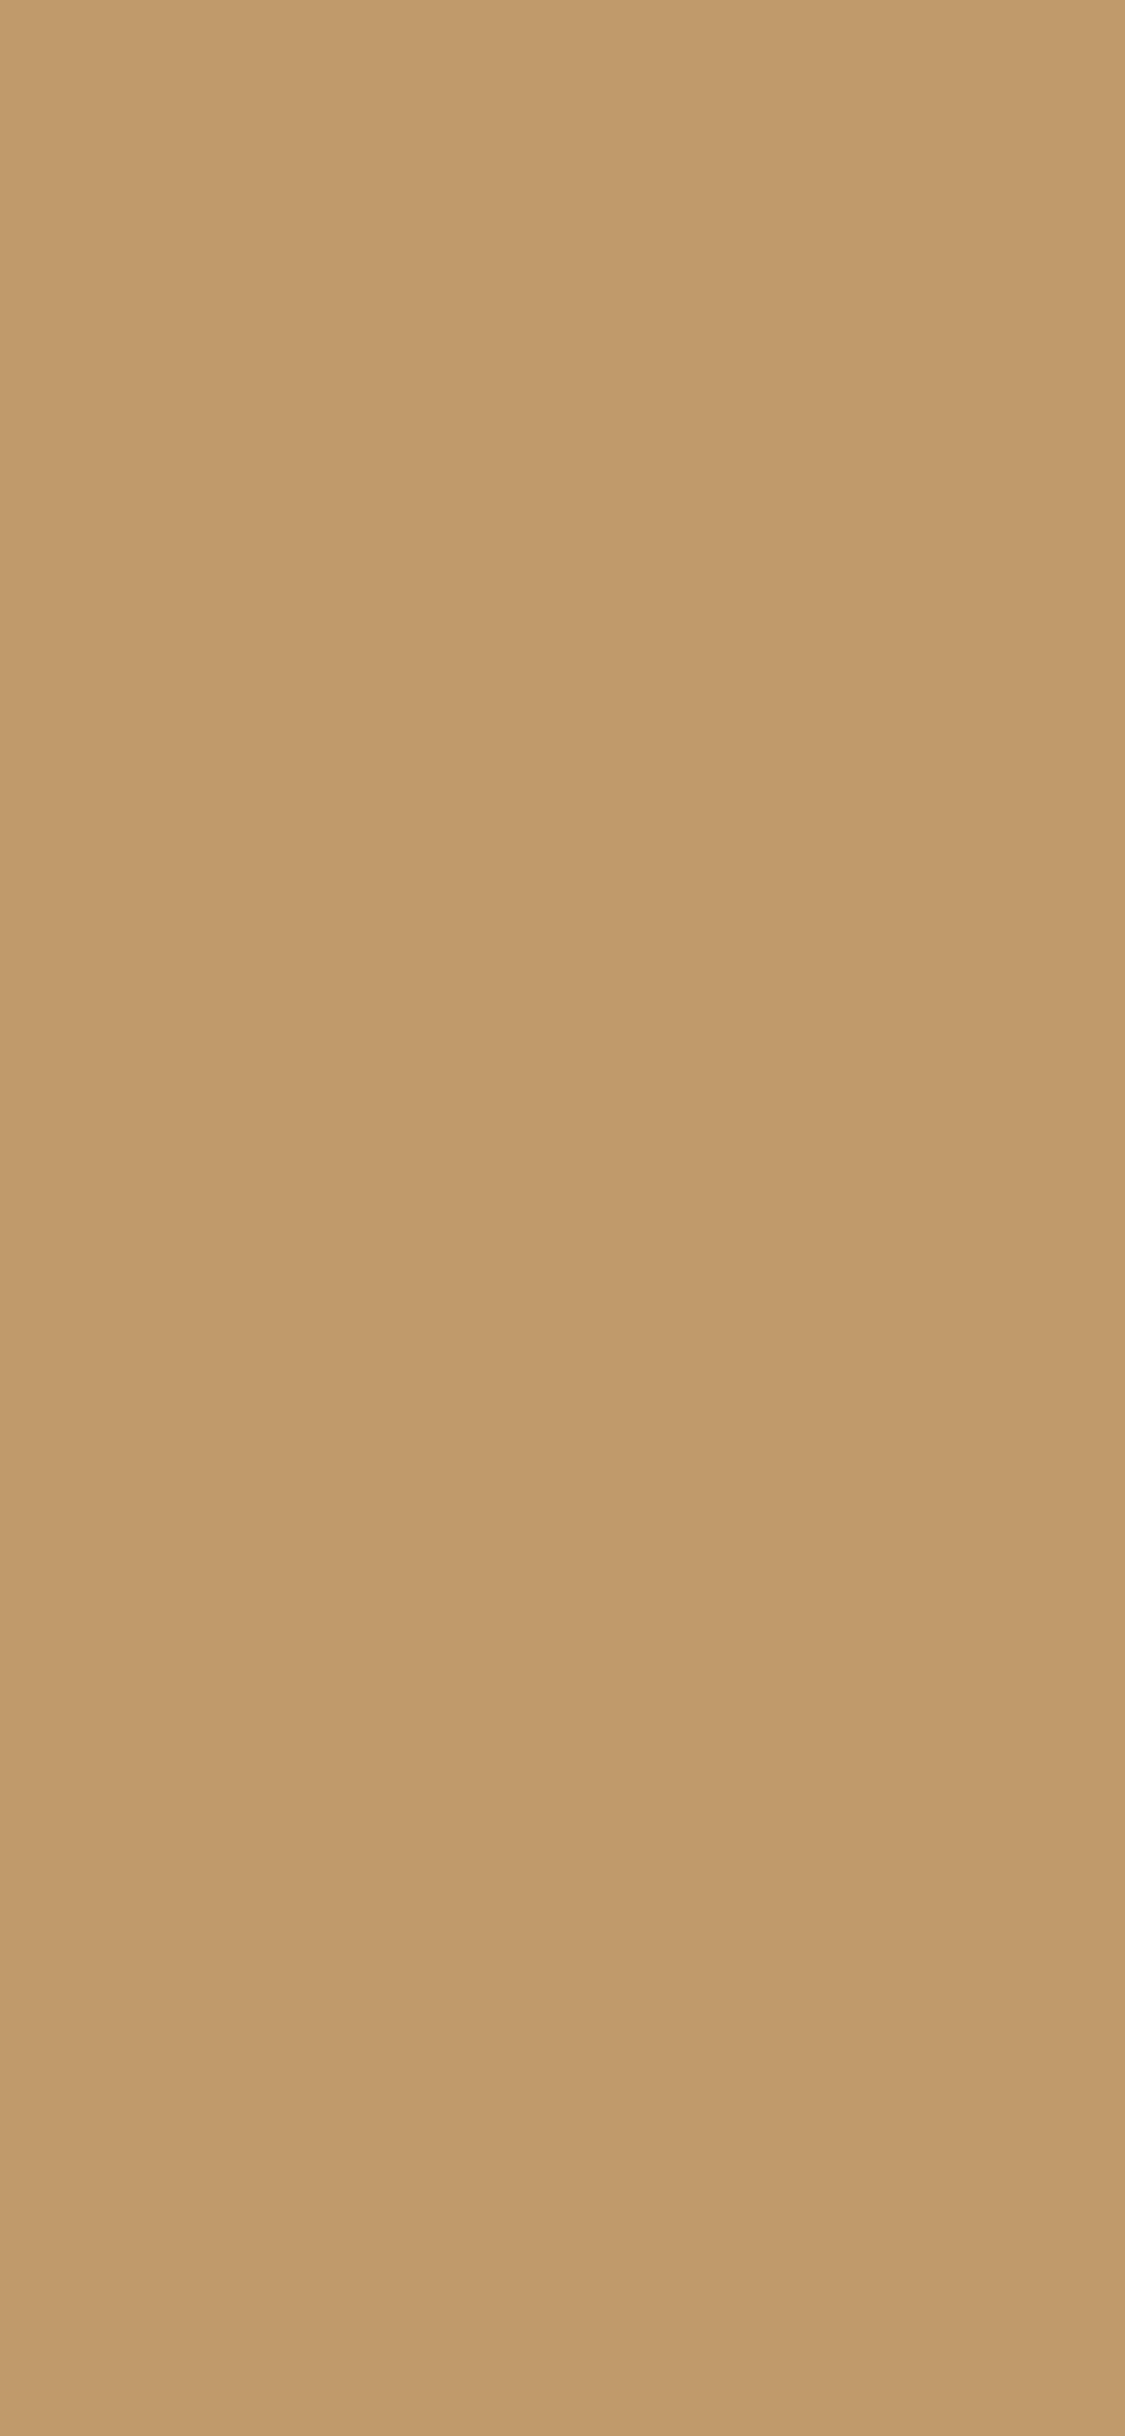 1125x2436 Camel Solid Color Background